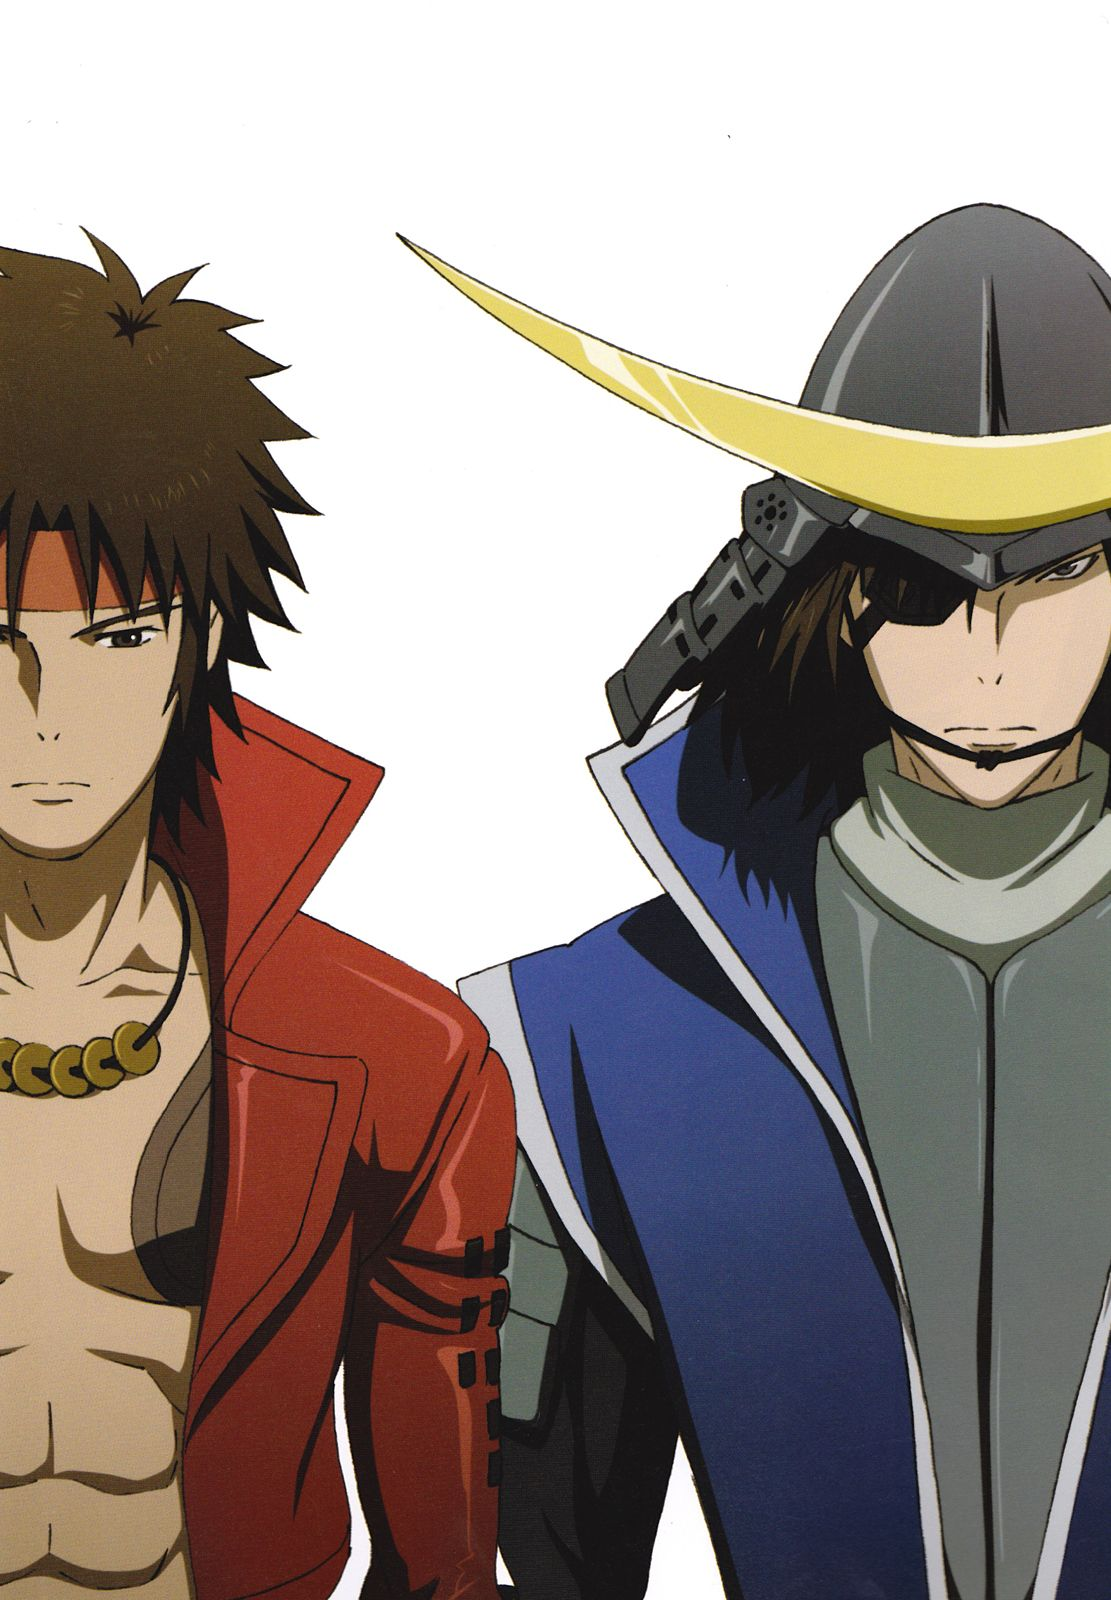 Date Masamune, Sanada Yukimura, Sengoku Basara Sengoku